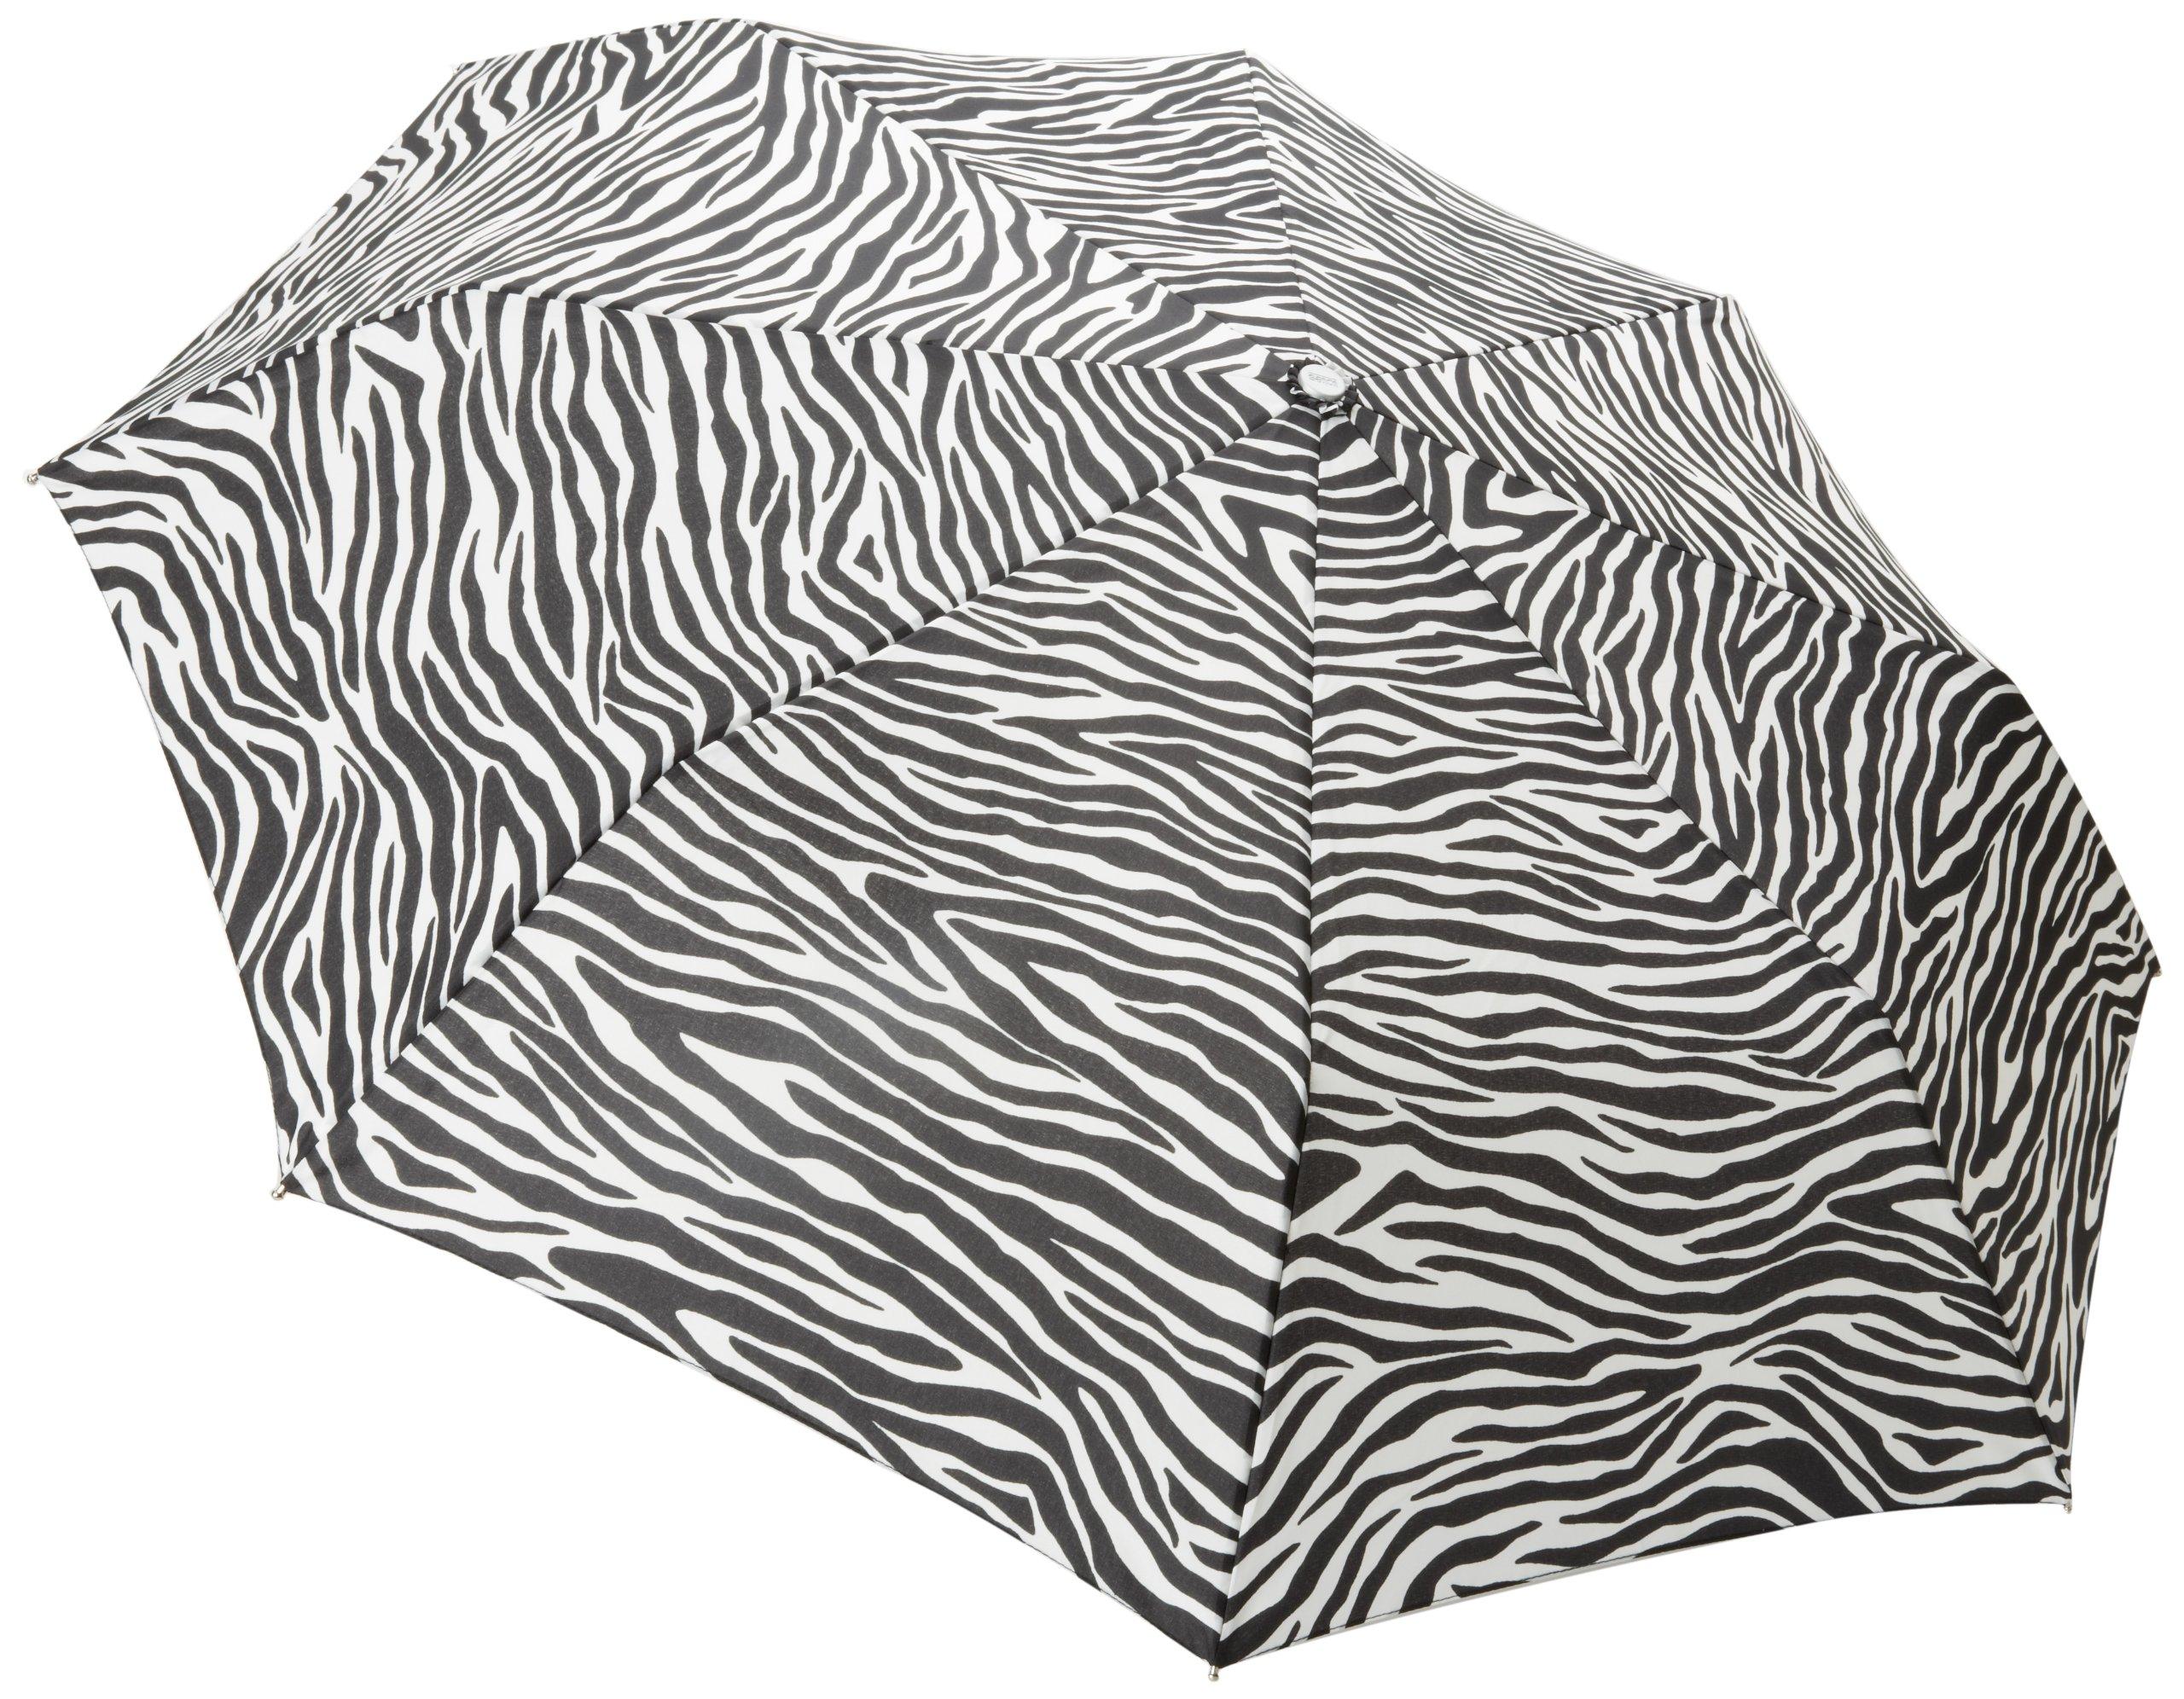 Totes Signature Basic Automatic Compact Umbrella, Zebra, One Size